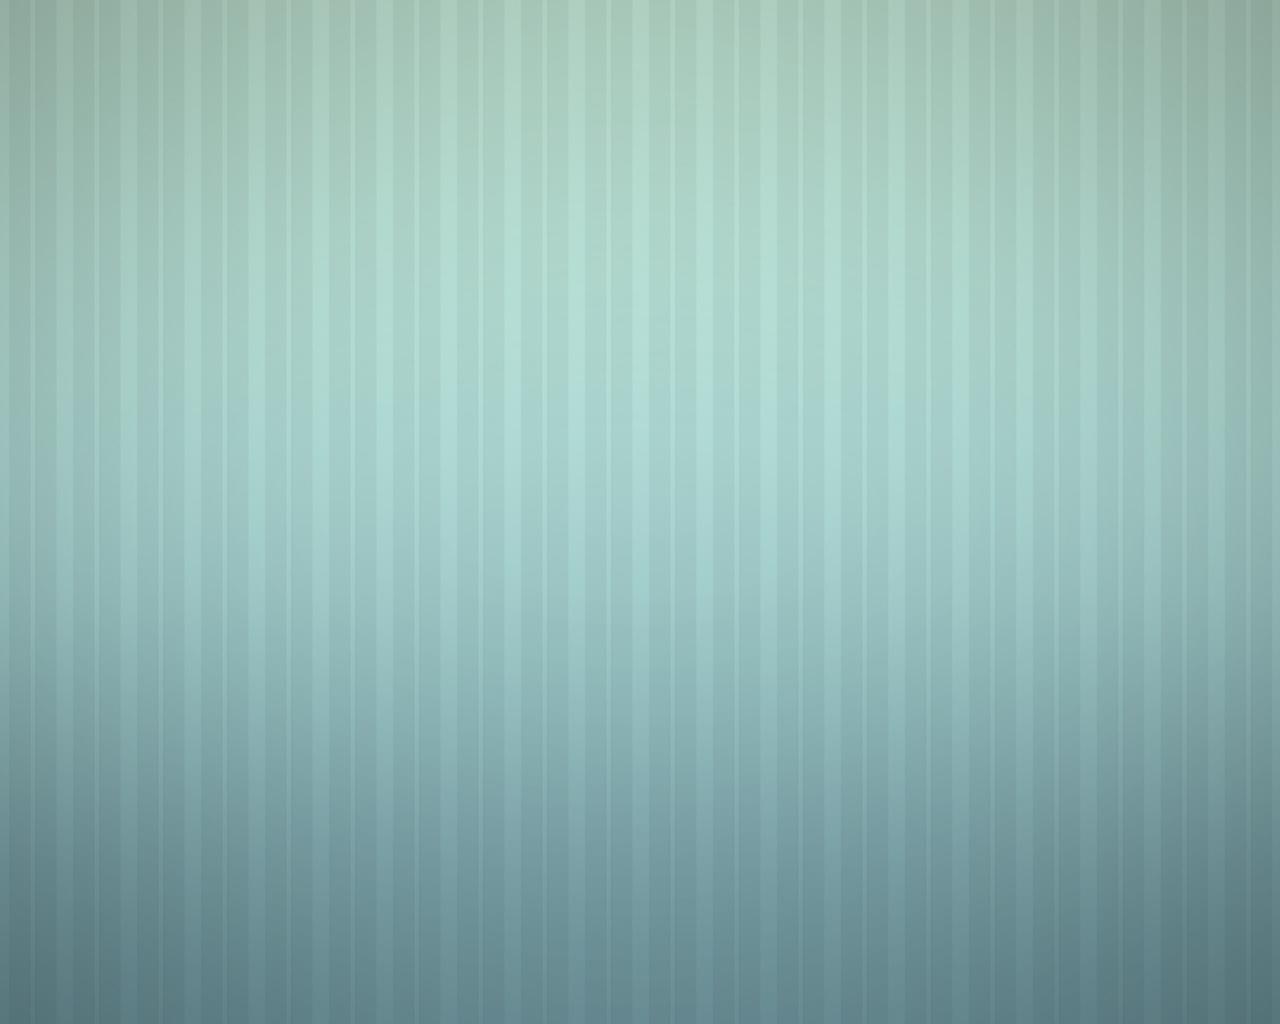 узоры, patterns, lines, texture, линий, Текстура, 2560x1600